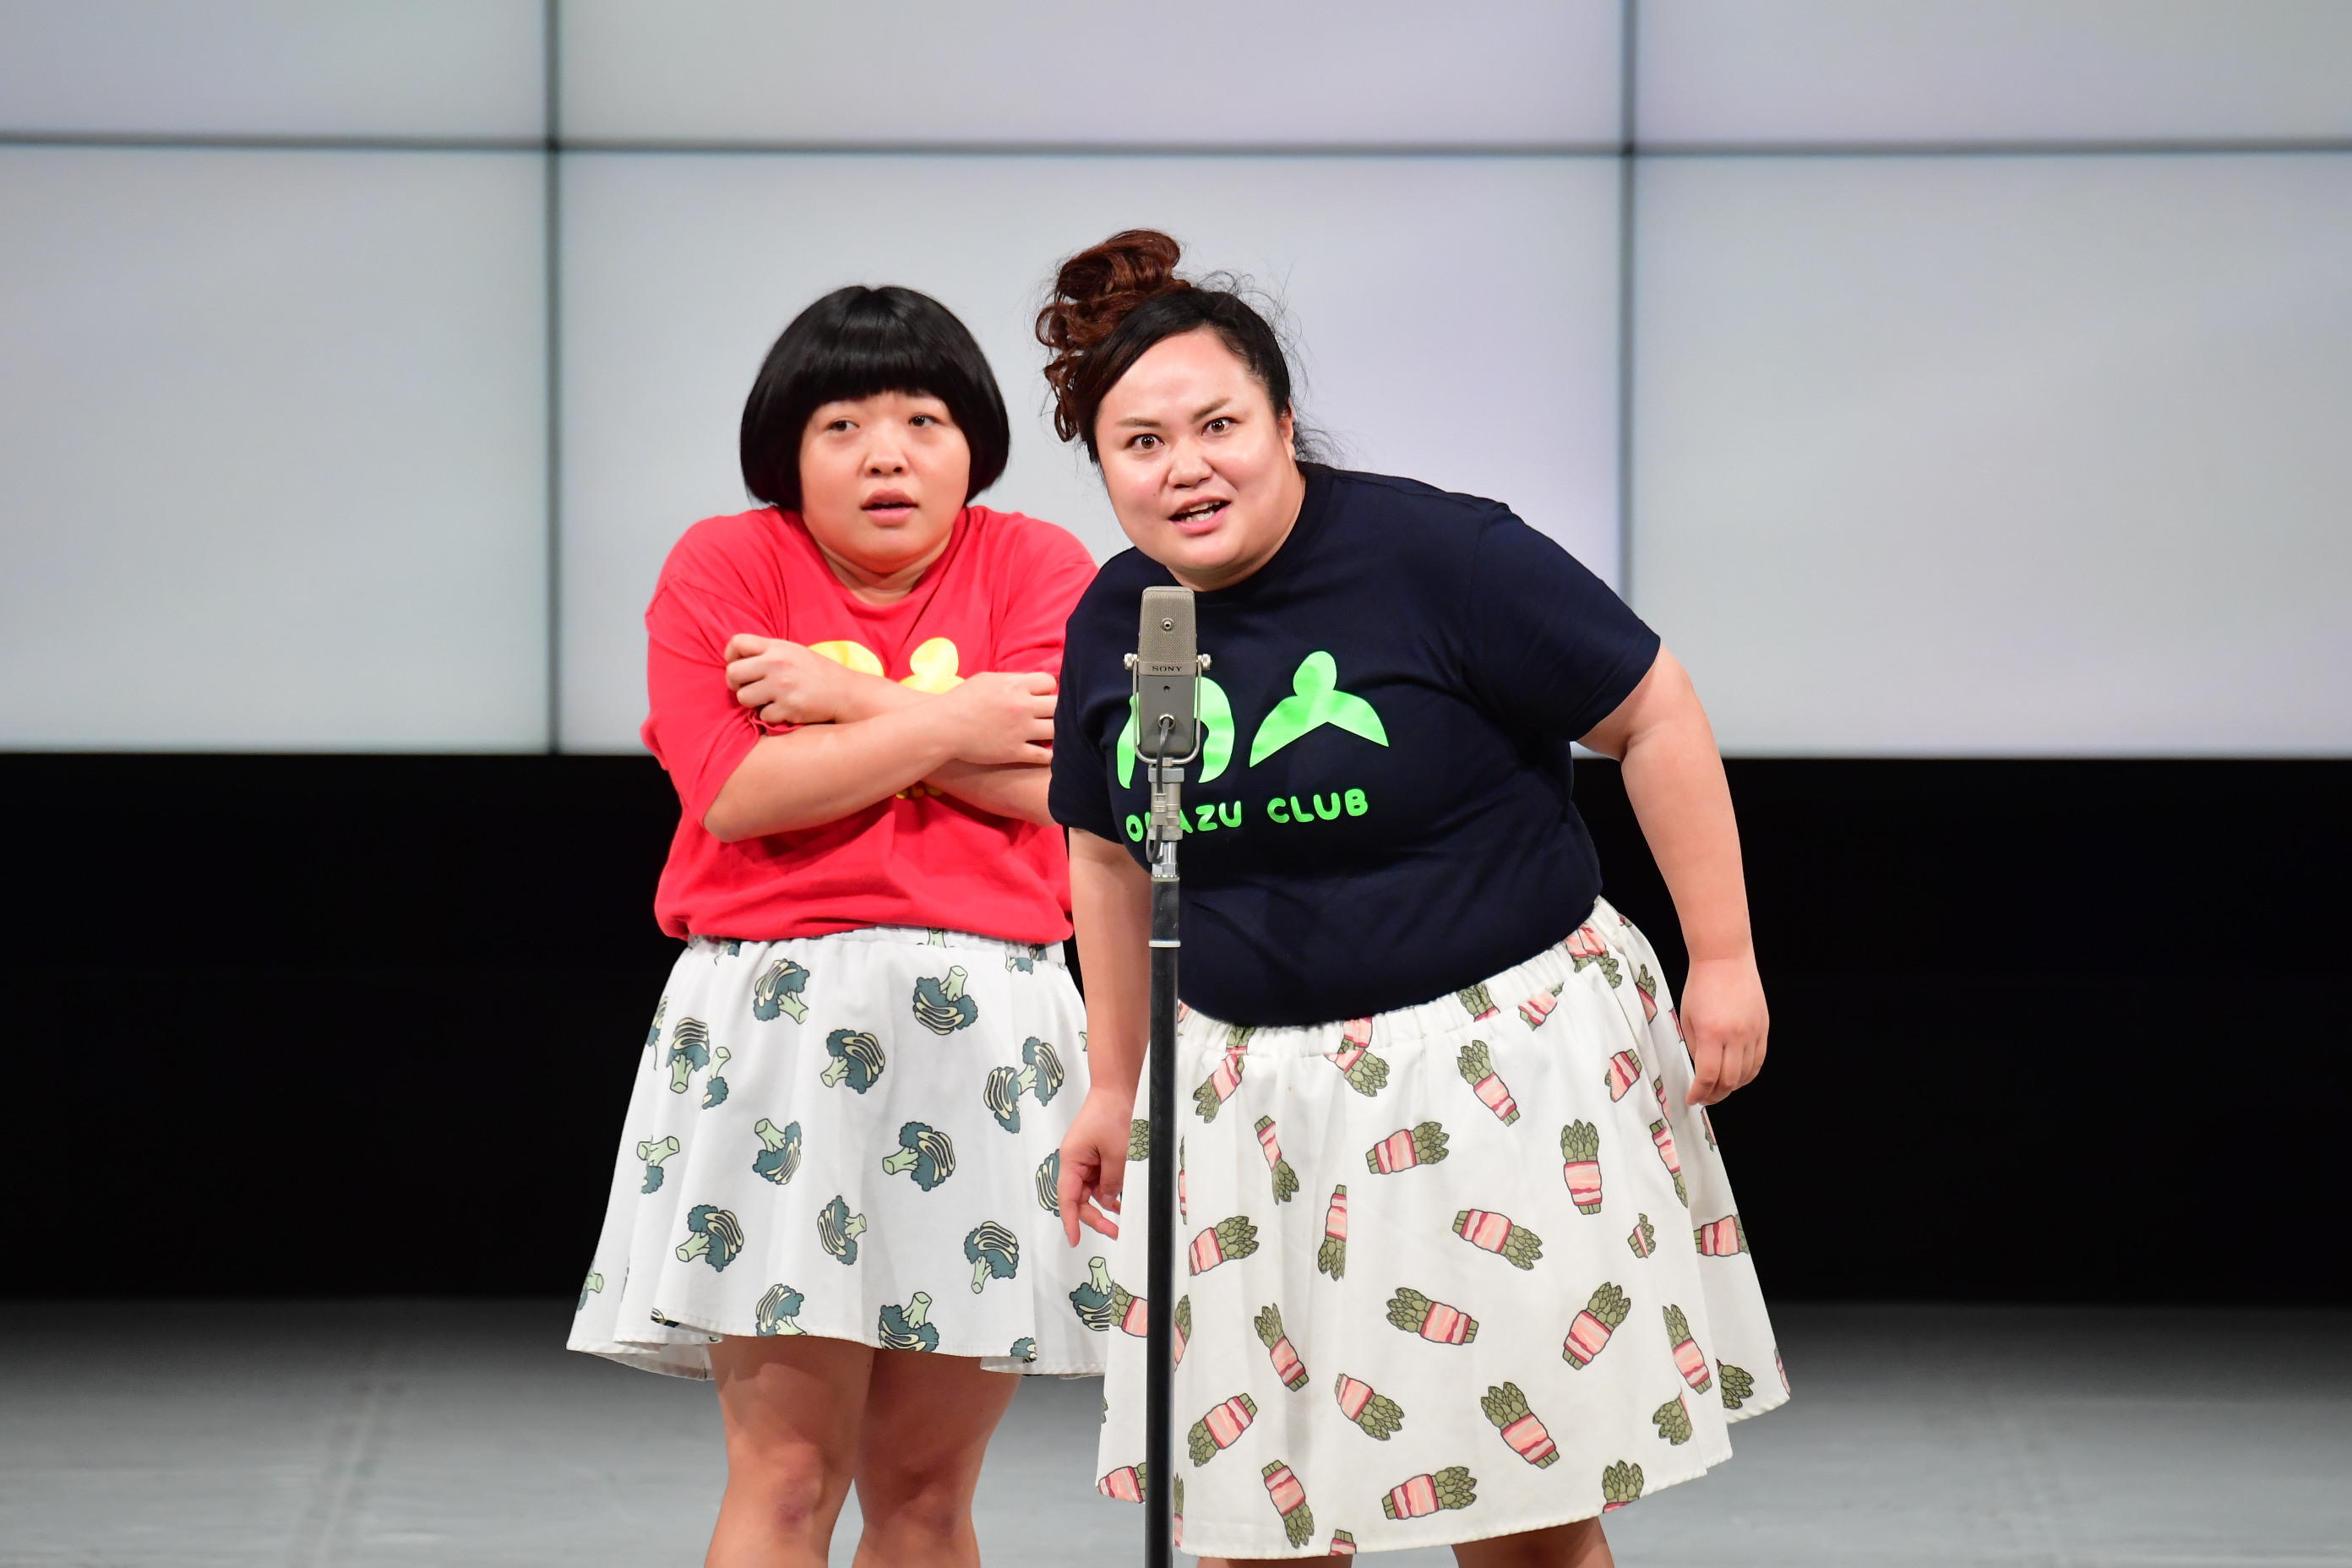 http://news.yoshimoto.co.jp/20180831234810-b263c11c3c792805f1e37554417671946b173f4c.jpg